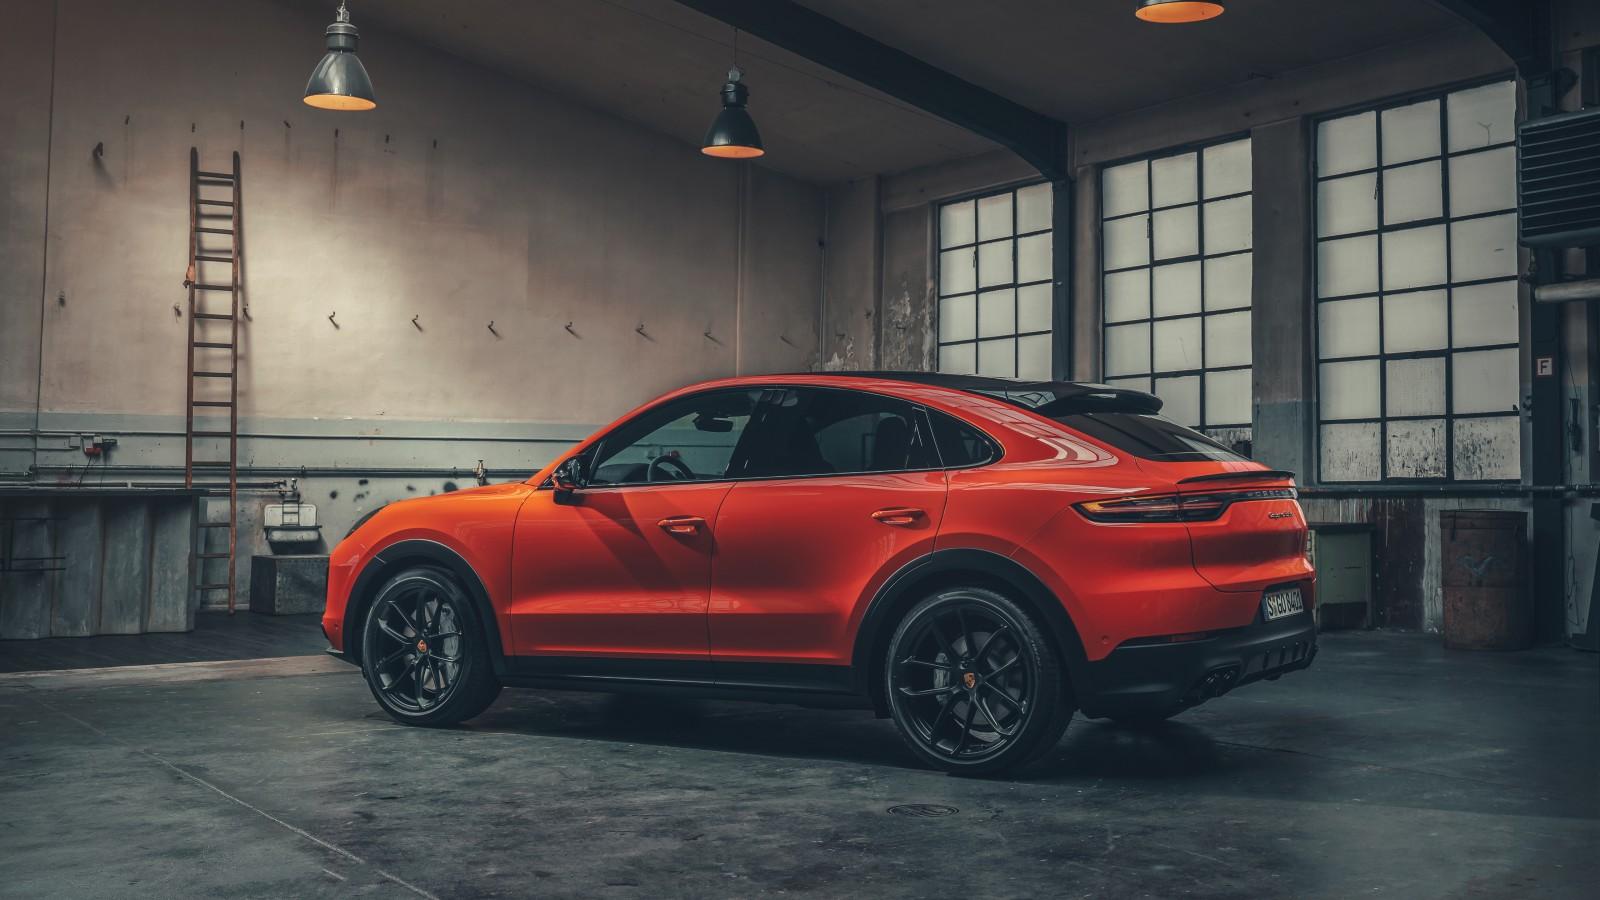 Porsche Carrera S >> Porsche Cayenne Turbo Coupe 2019 4K 2 Wallpaper | HD Car ...